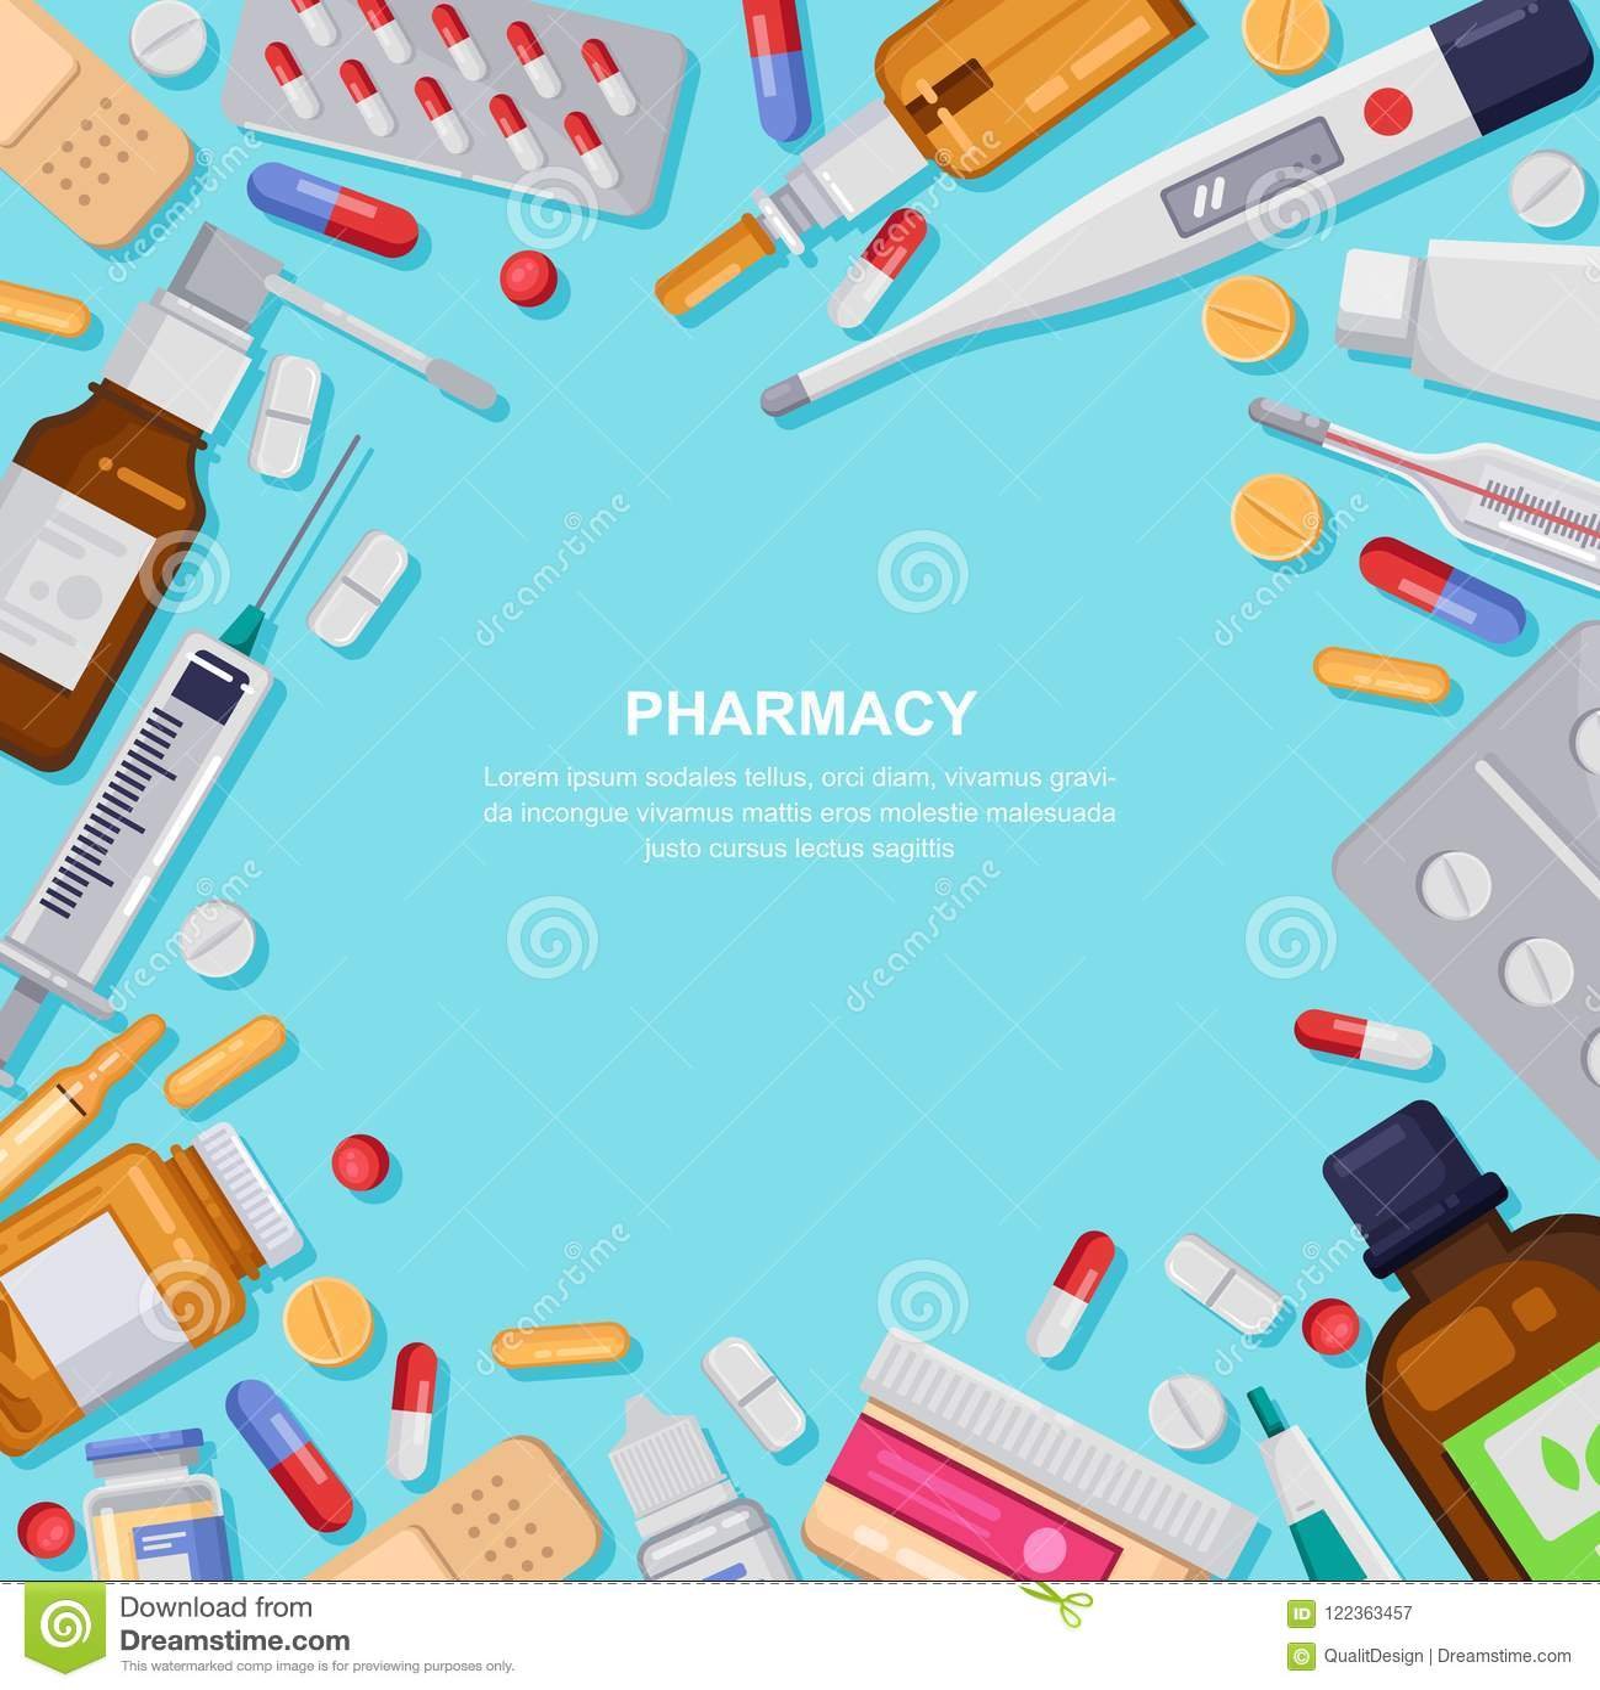 Pharmacy Frame With Pills Drugs Bottles Drugstore Illustration Medicine Healthcare Banner Poster Background Stock Vector Illustration Of Flat Cartoon 122363457